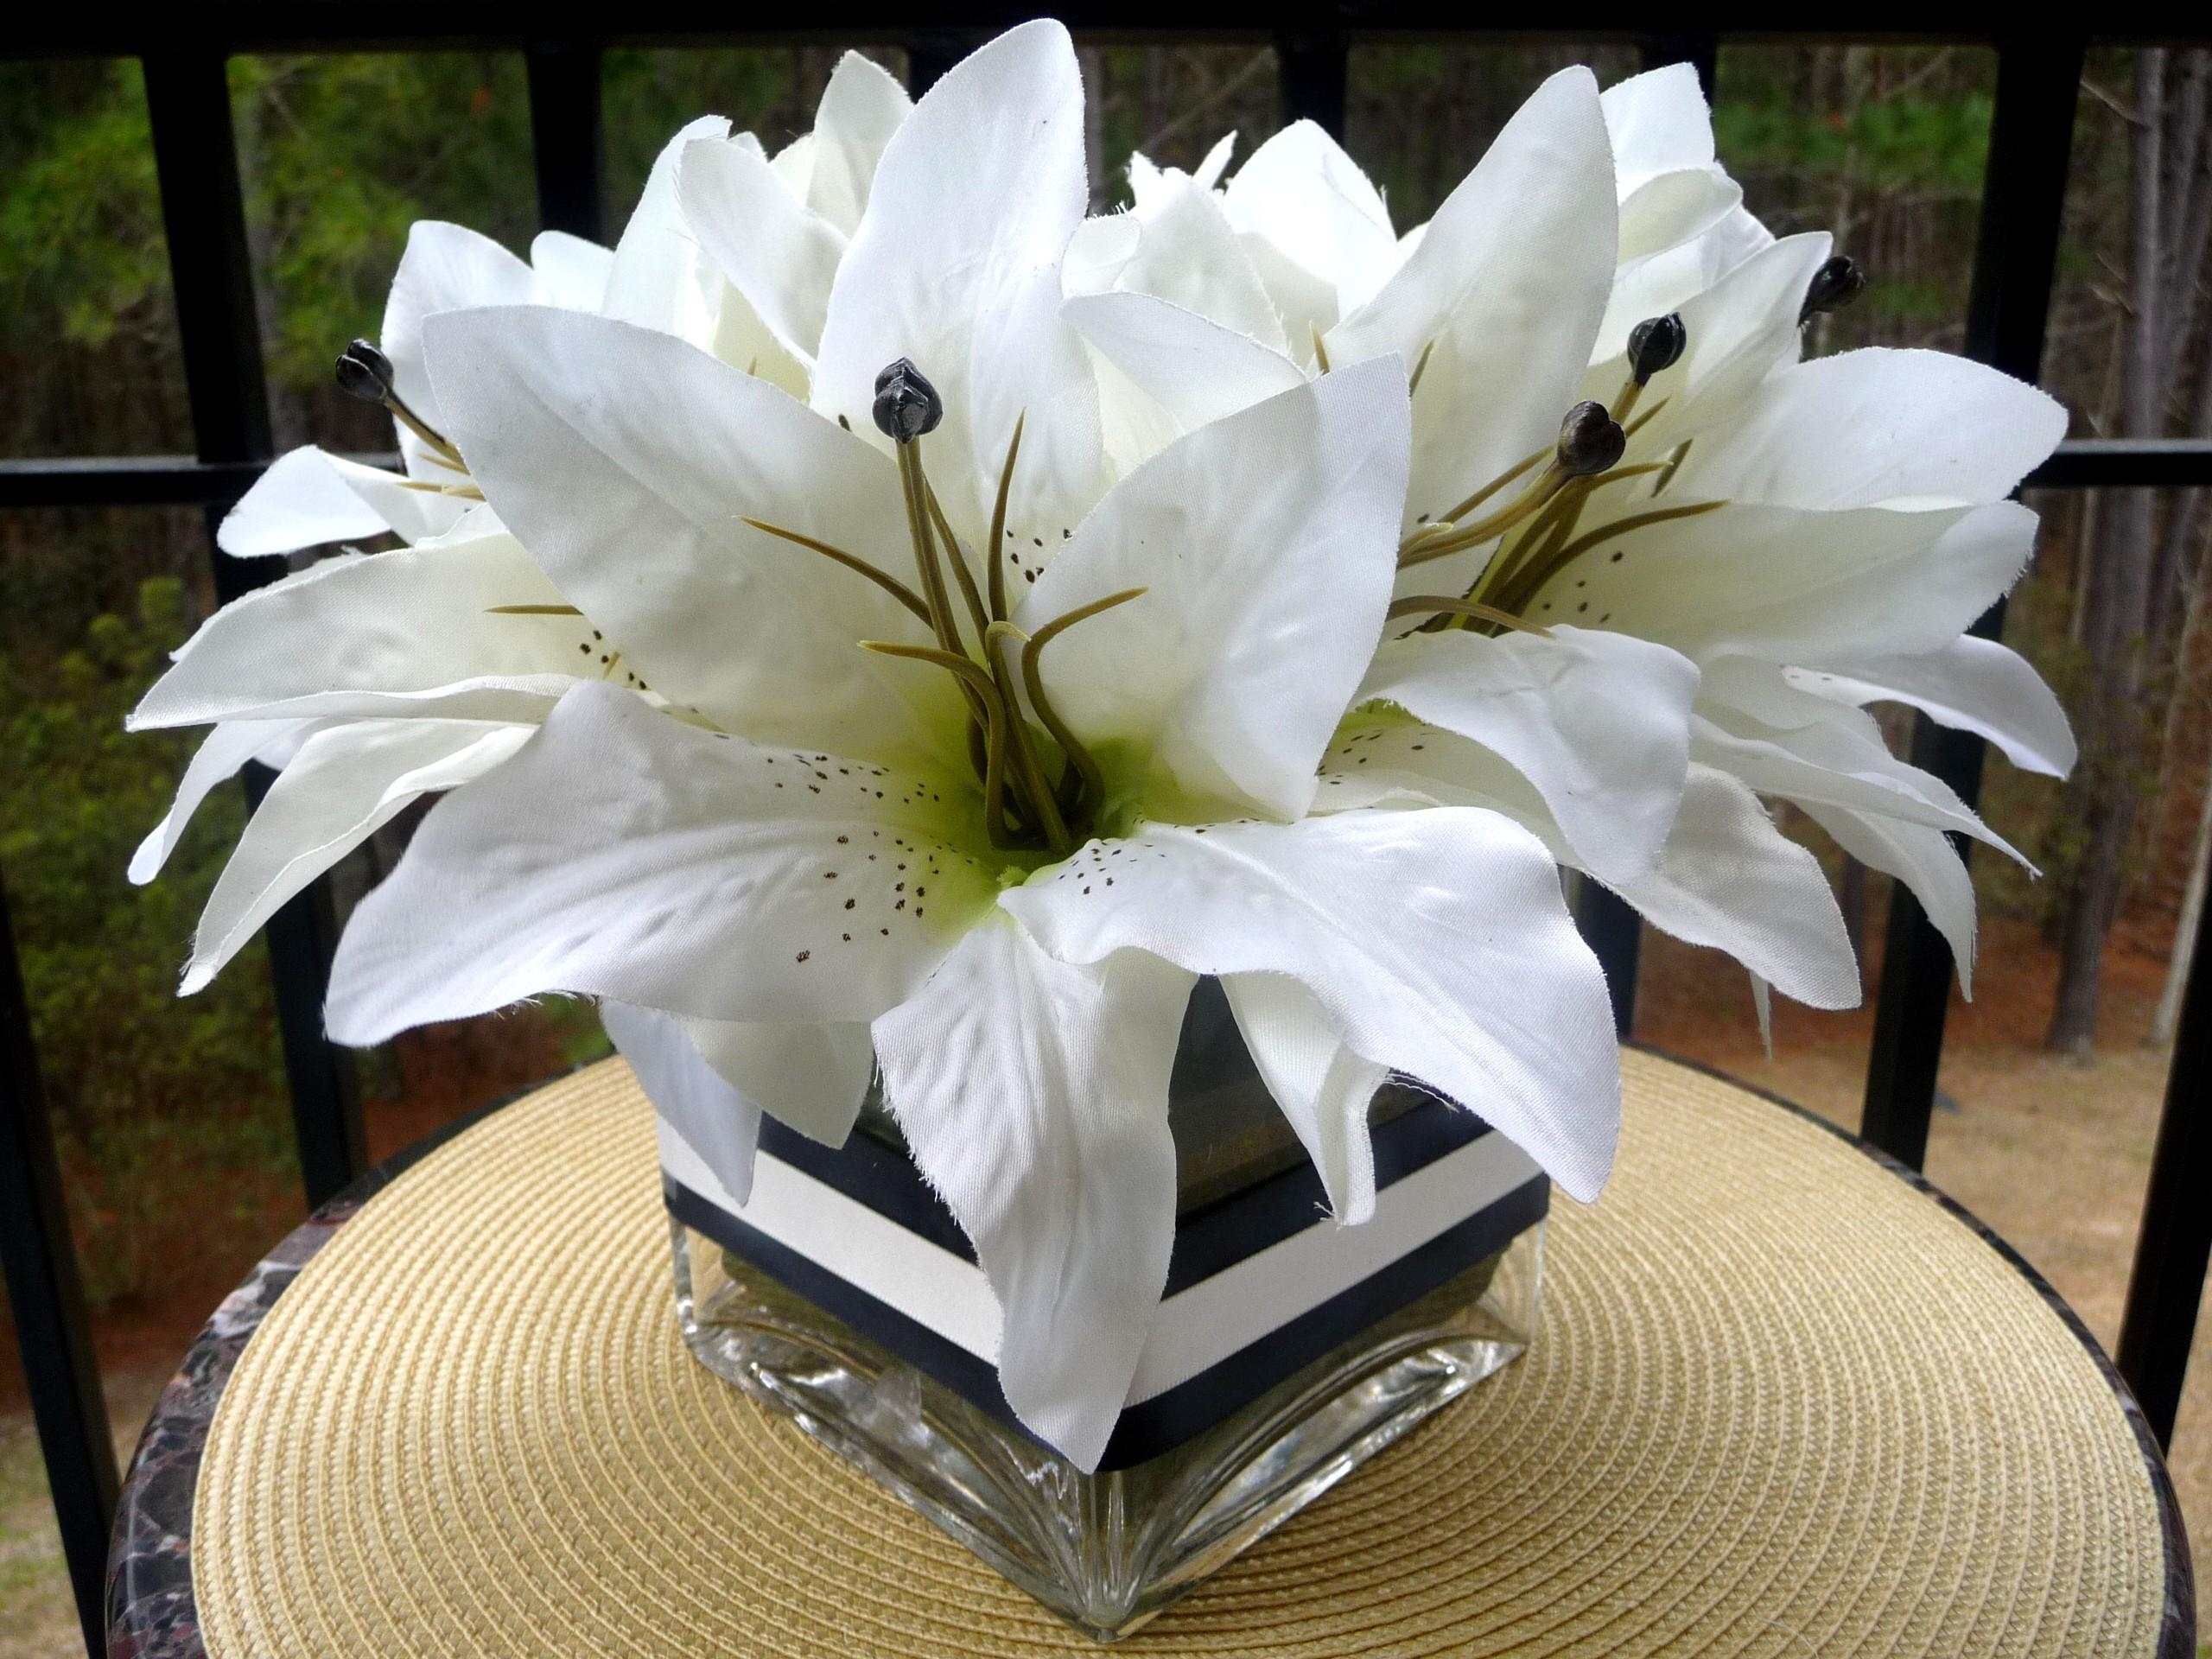 Ceremony, Inspiration, Reception, Flowers & Decor, white, black, Ceremony Flowers, Centerpieces, Flowers, Centerpiece, Wedding, Lilies, Board, Silk, Luncheon, Savannah event decor